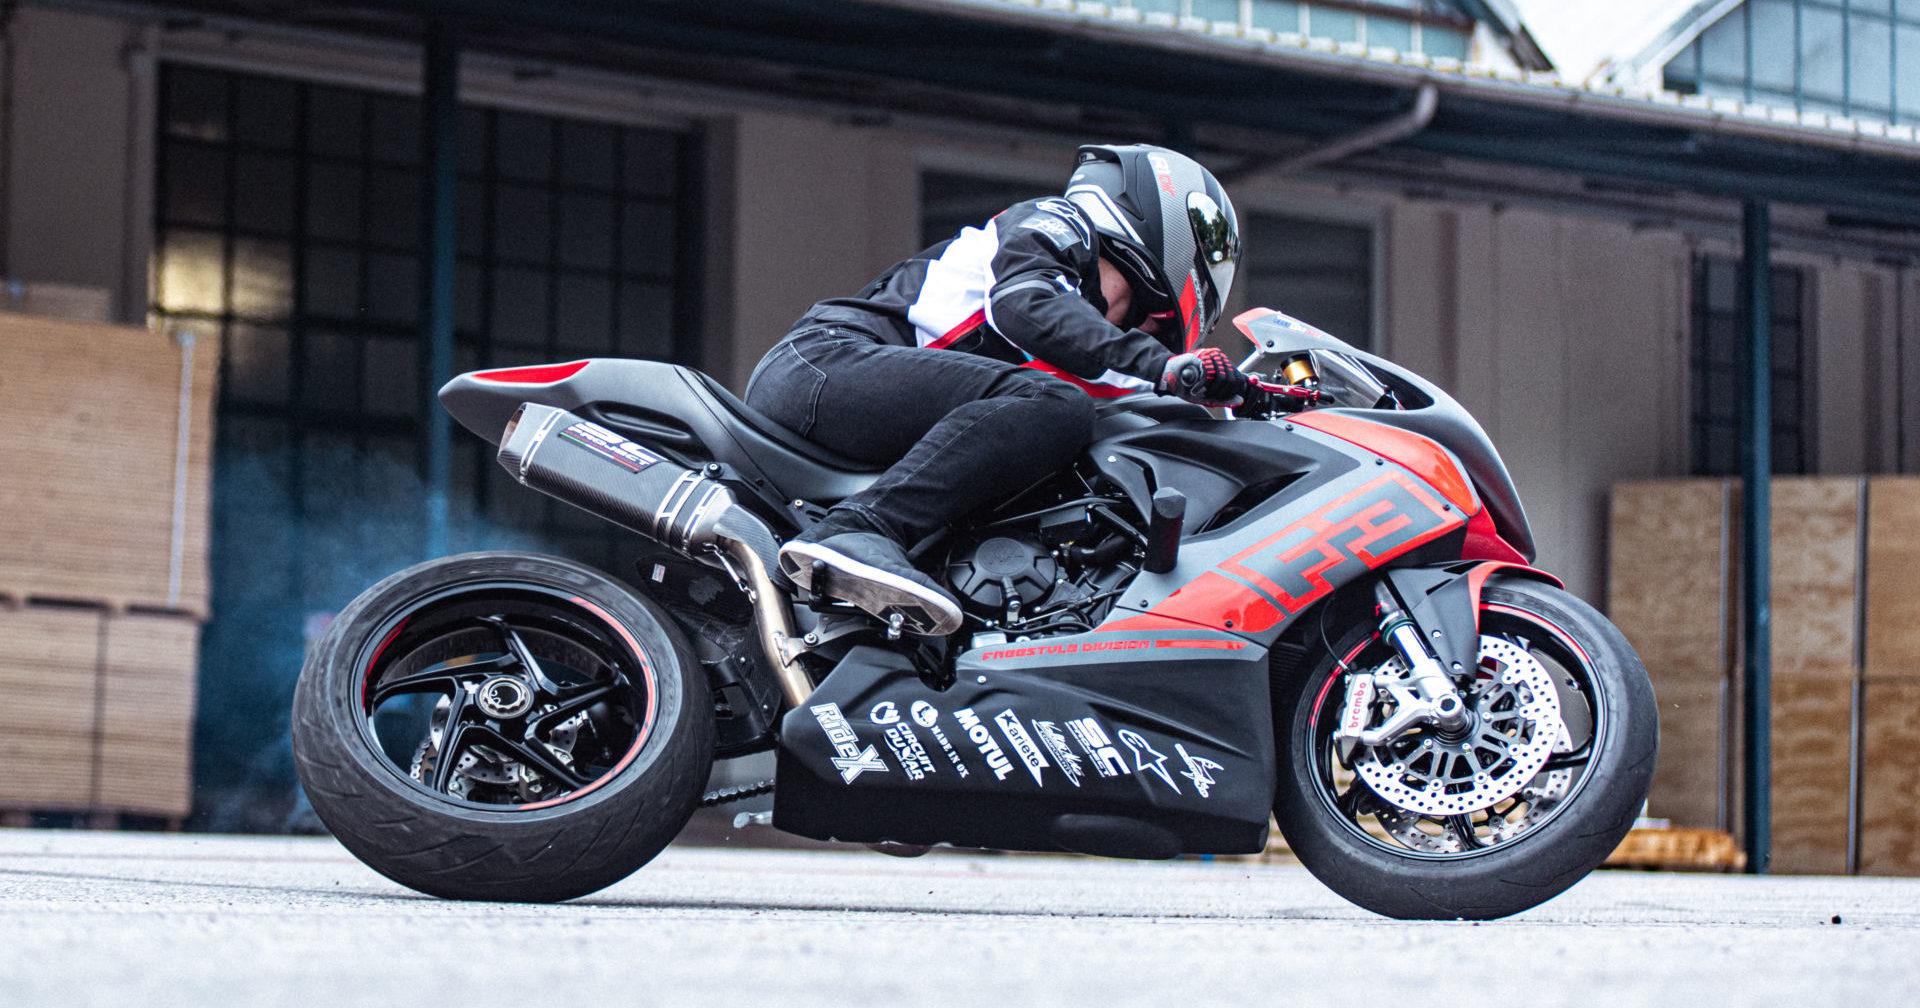 Stunt rider Thibaut Nogues in action on his MV Agusta F3 800. Photo courtesy MV Agusta.